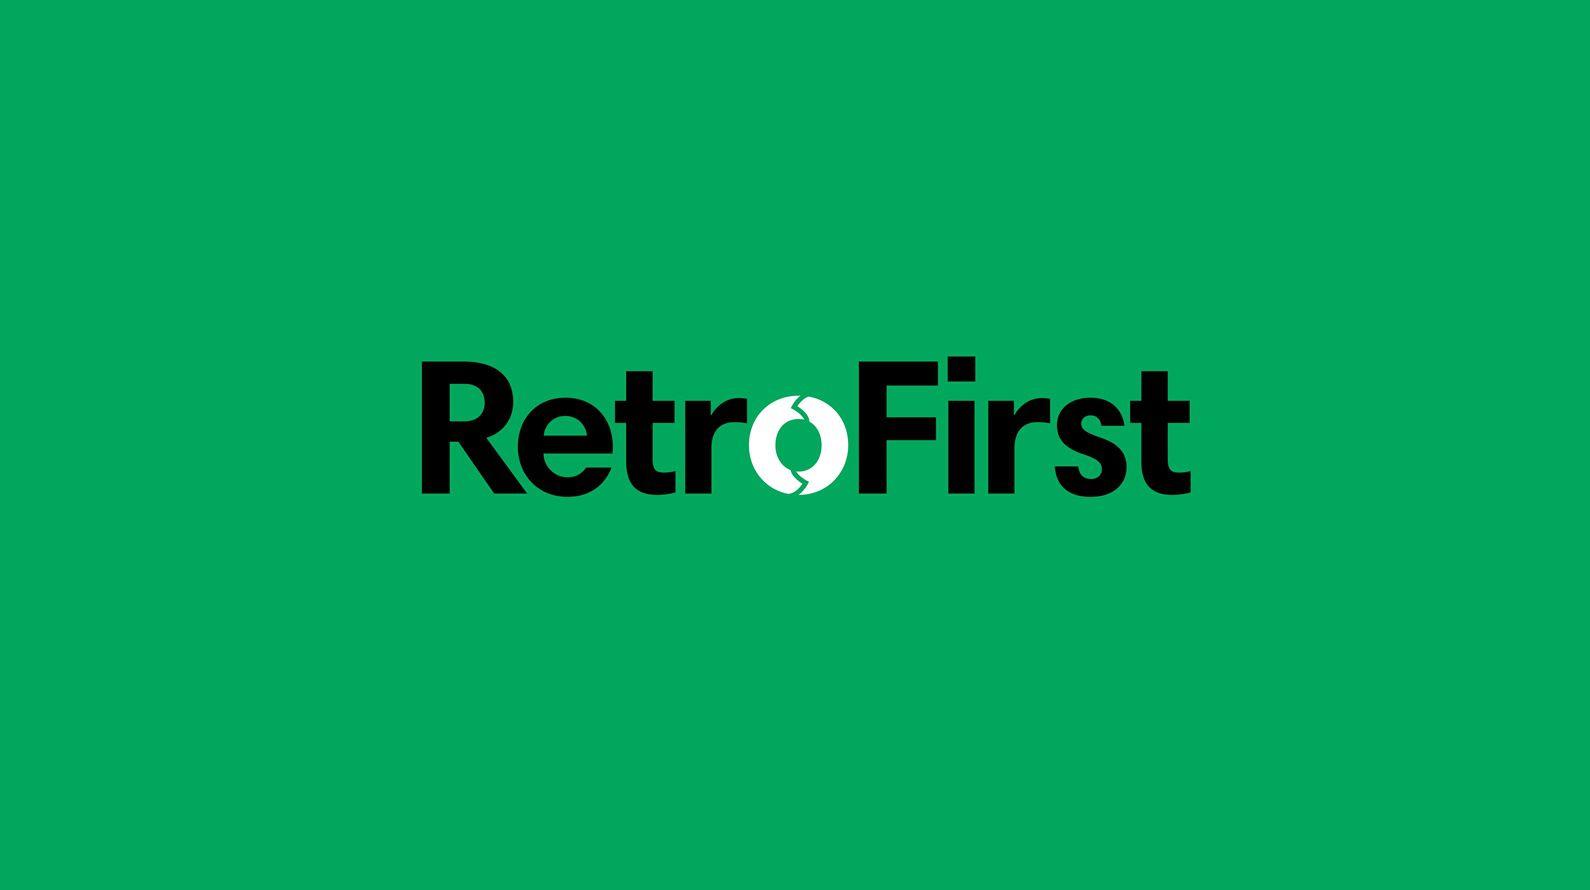 Retrofirst